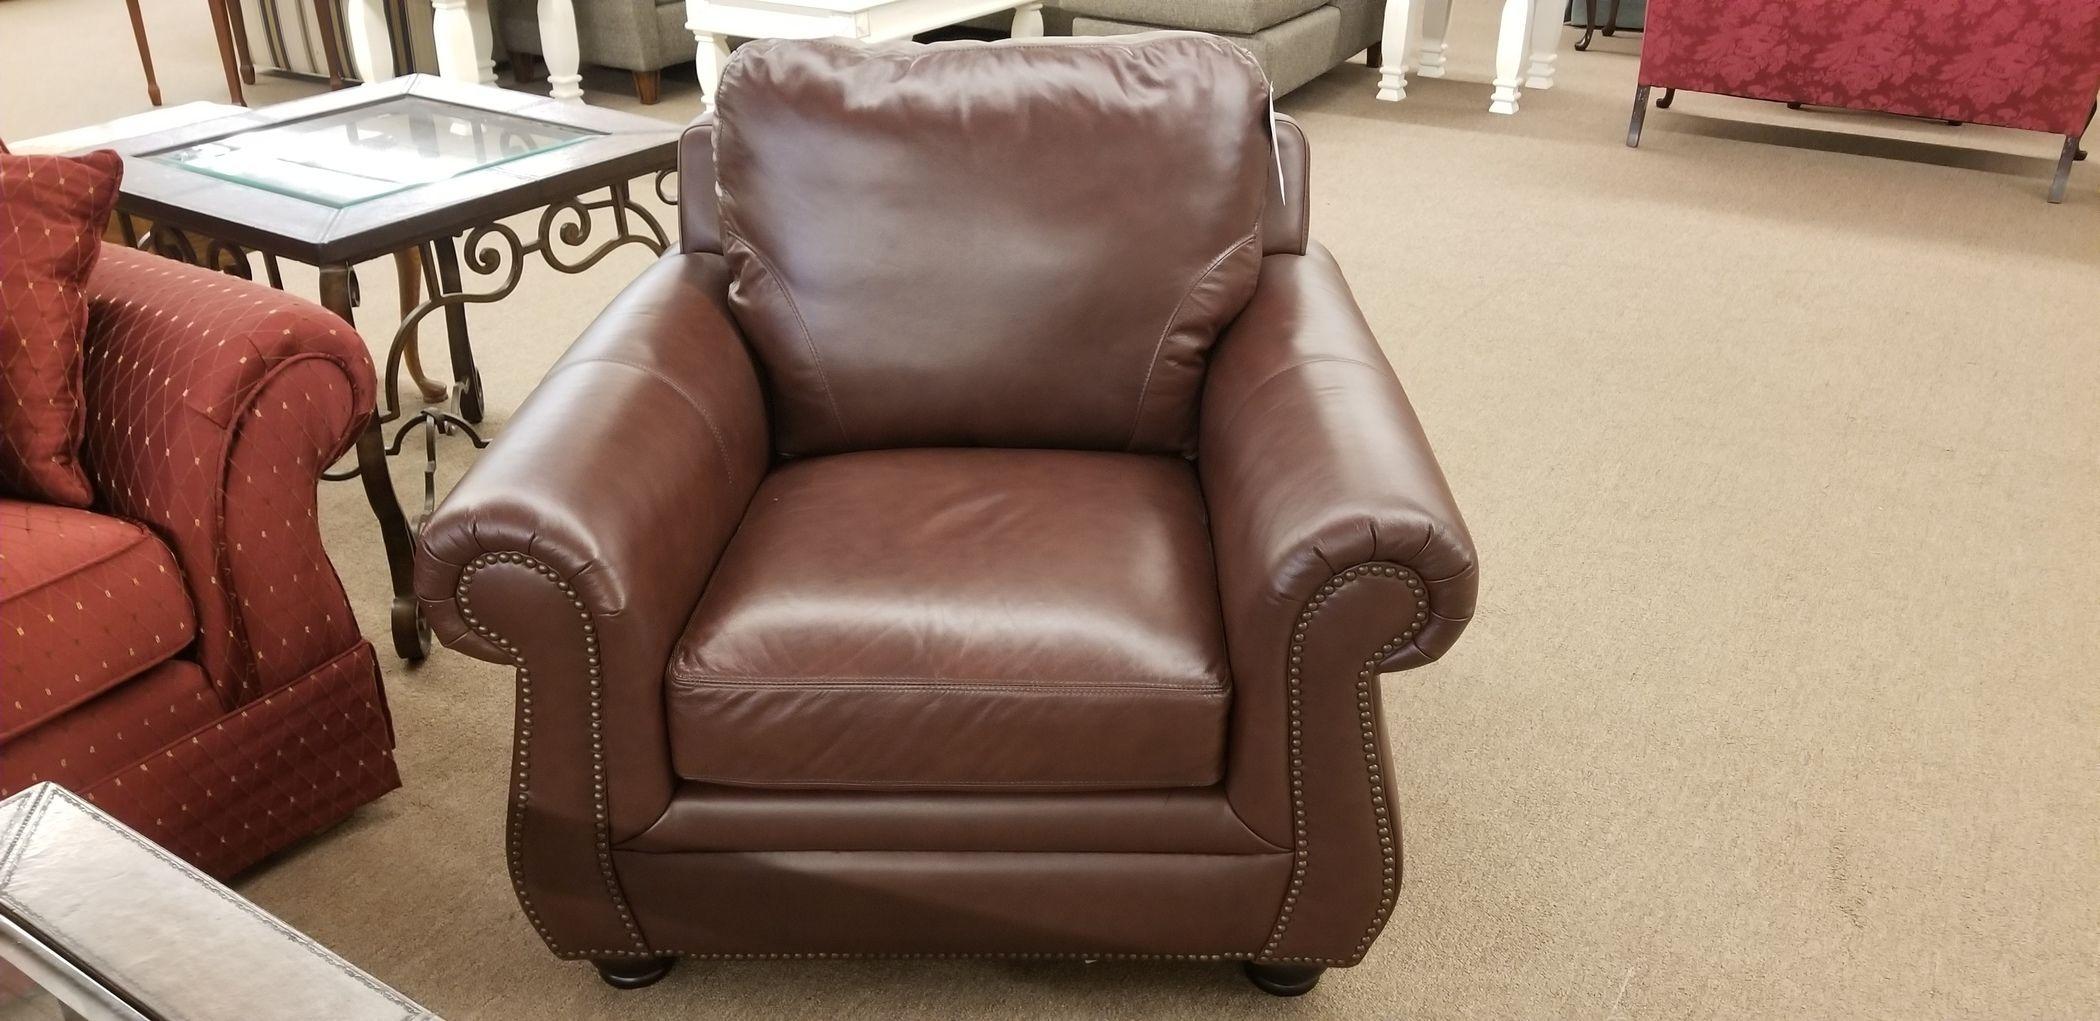 LEATHER CHAIR W/NAILHEAD TRIM | Delmarva Furniture Consignment